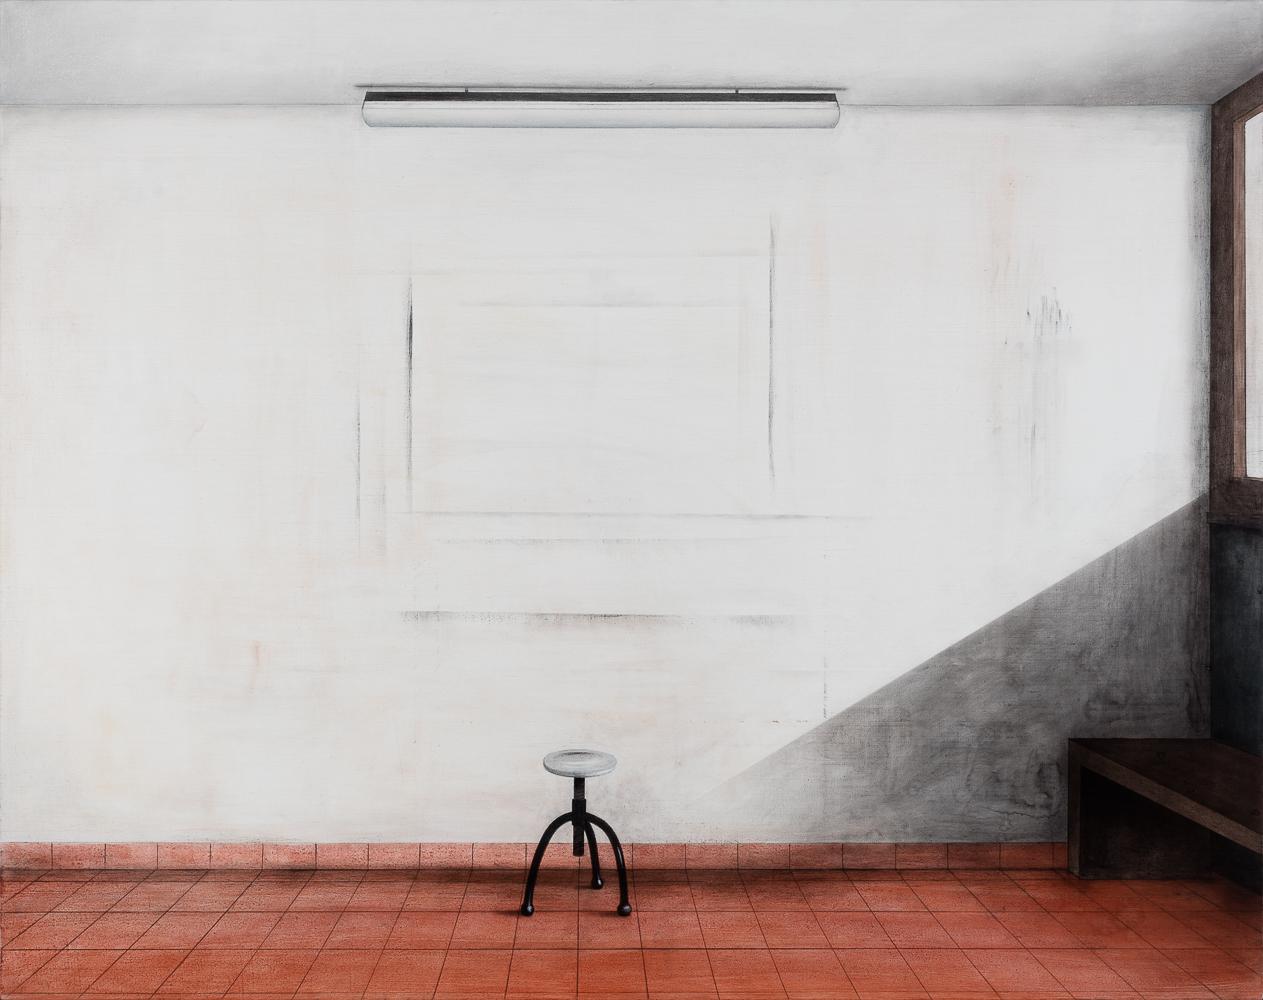 Eduard Angeli_Wienerroither & Kohlbacher_Kunst-Dokumentation.com_web_002.jpg